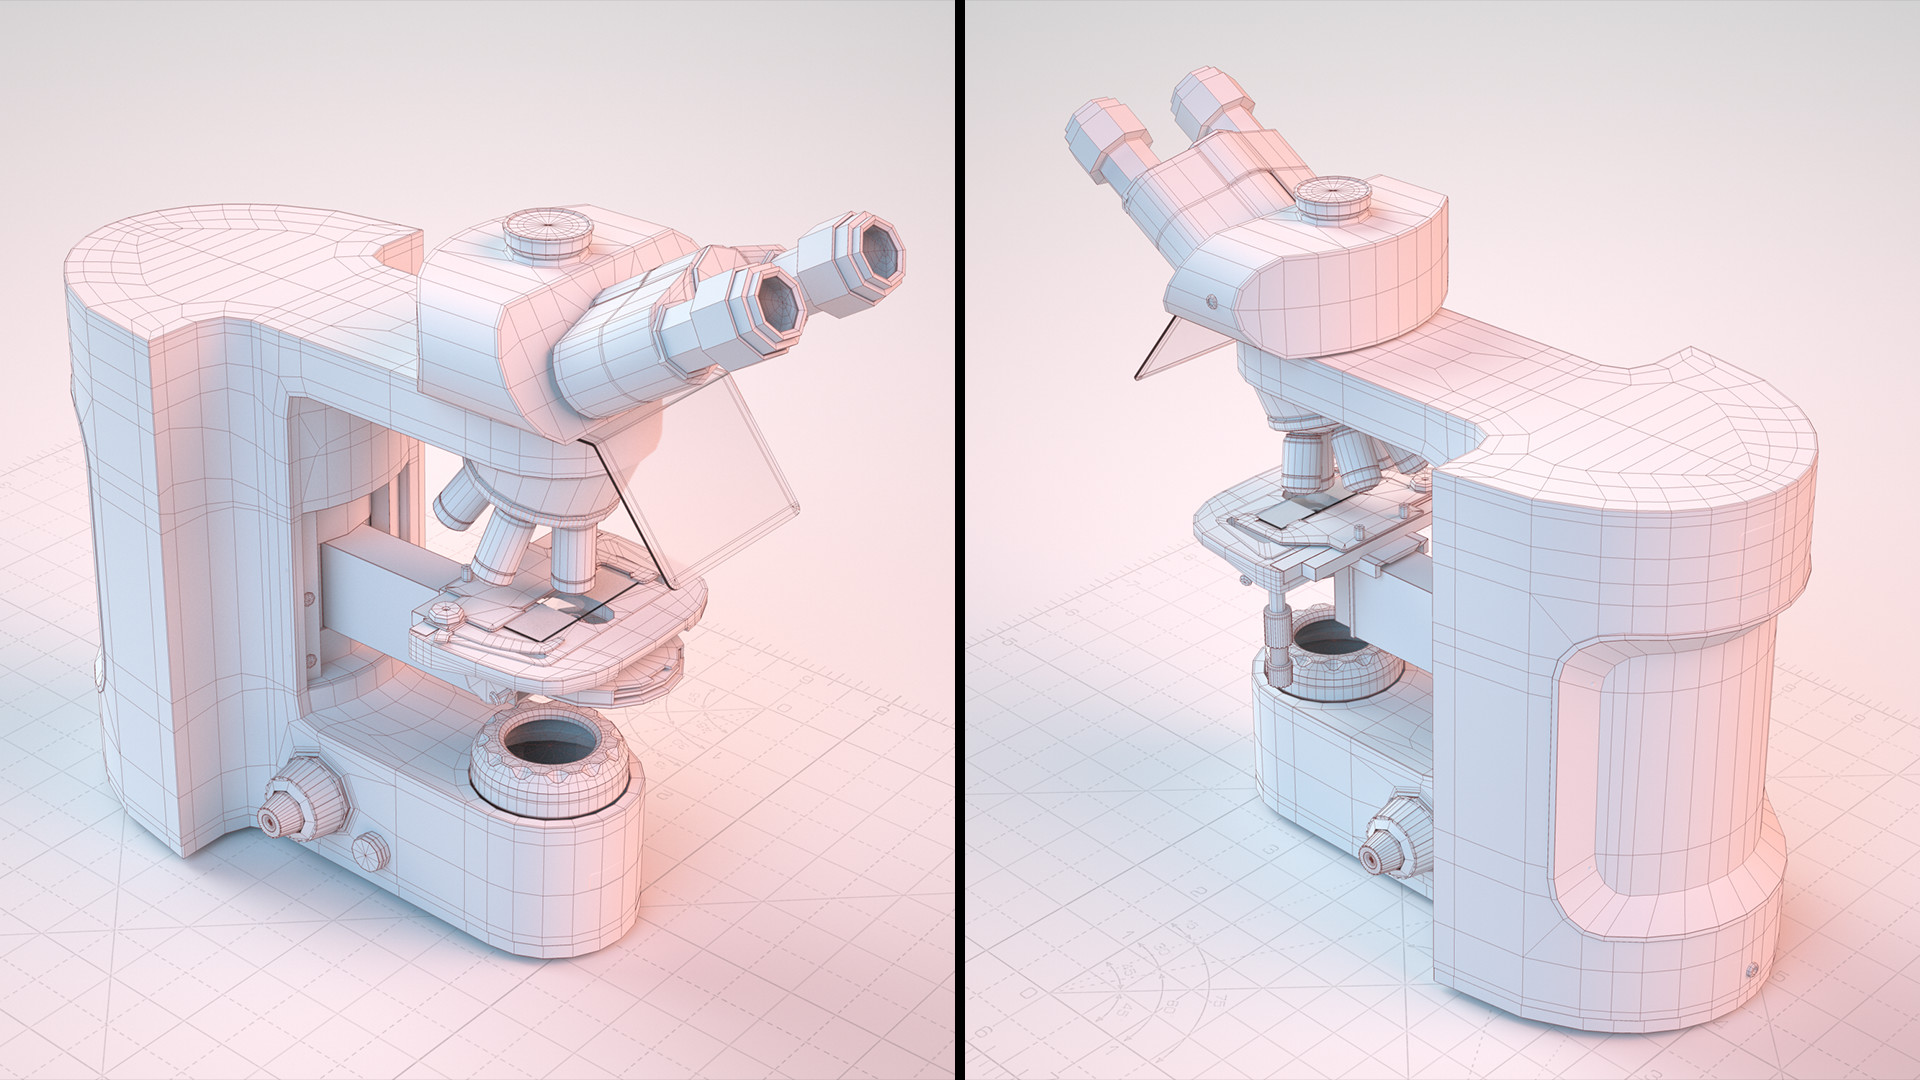 Basile arquis microscope wire 03 comp